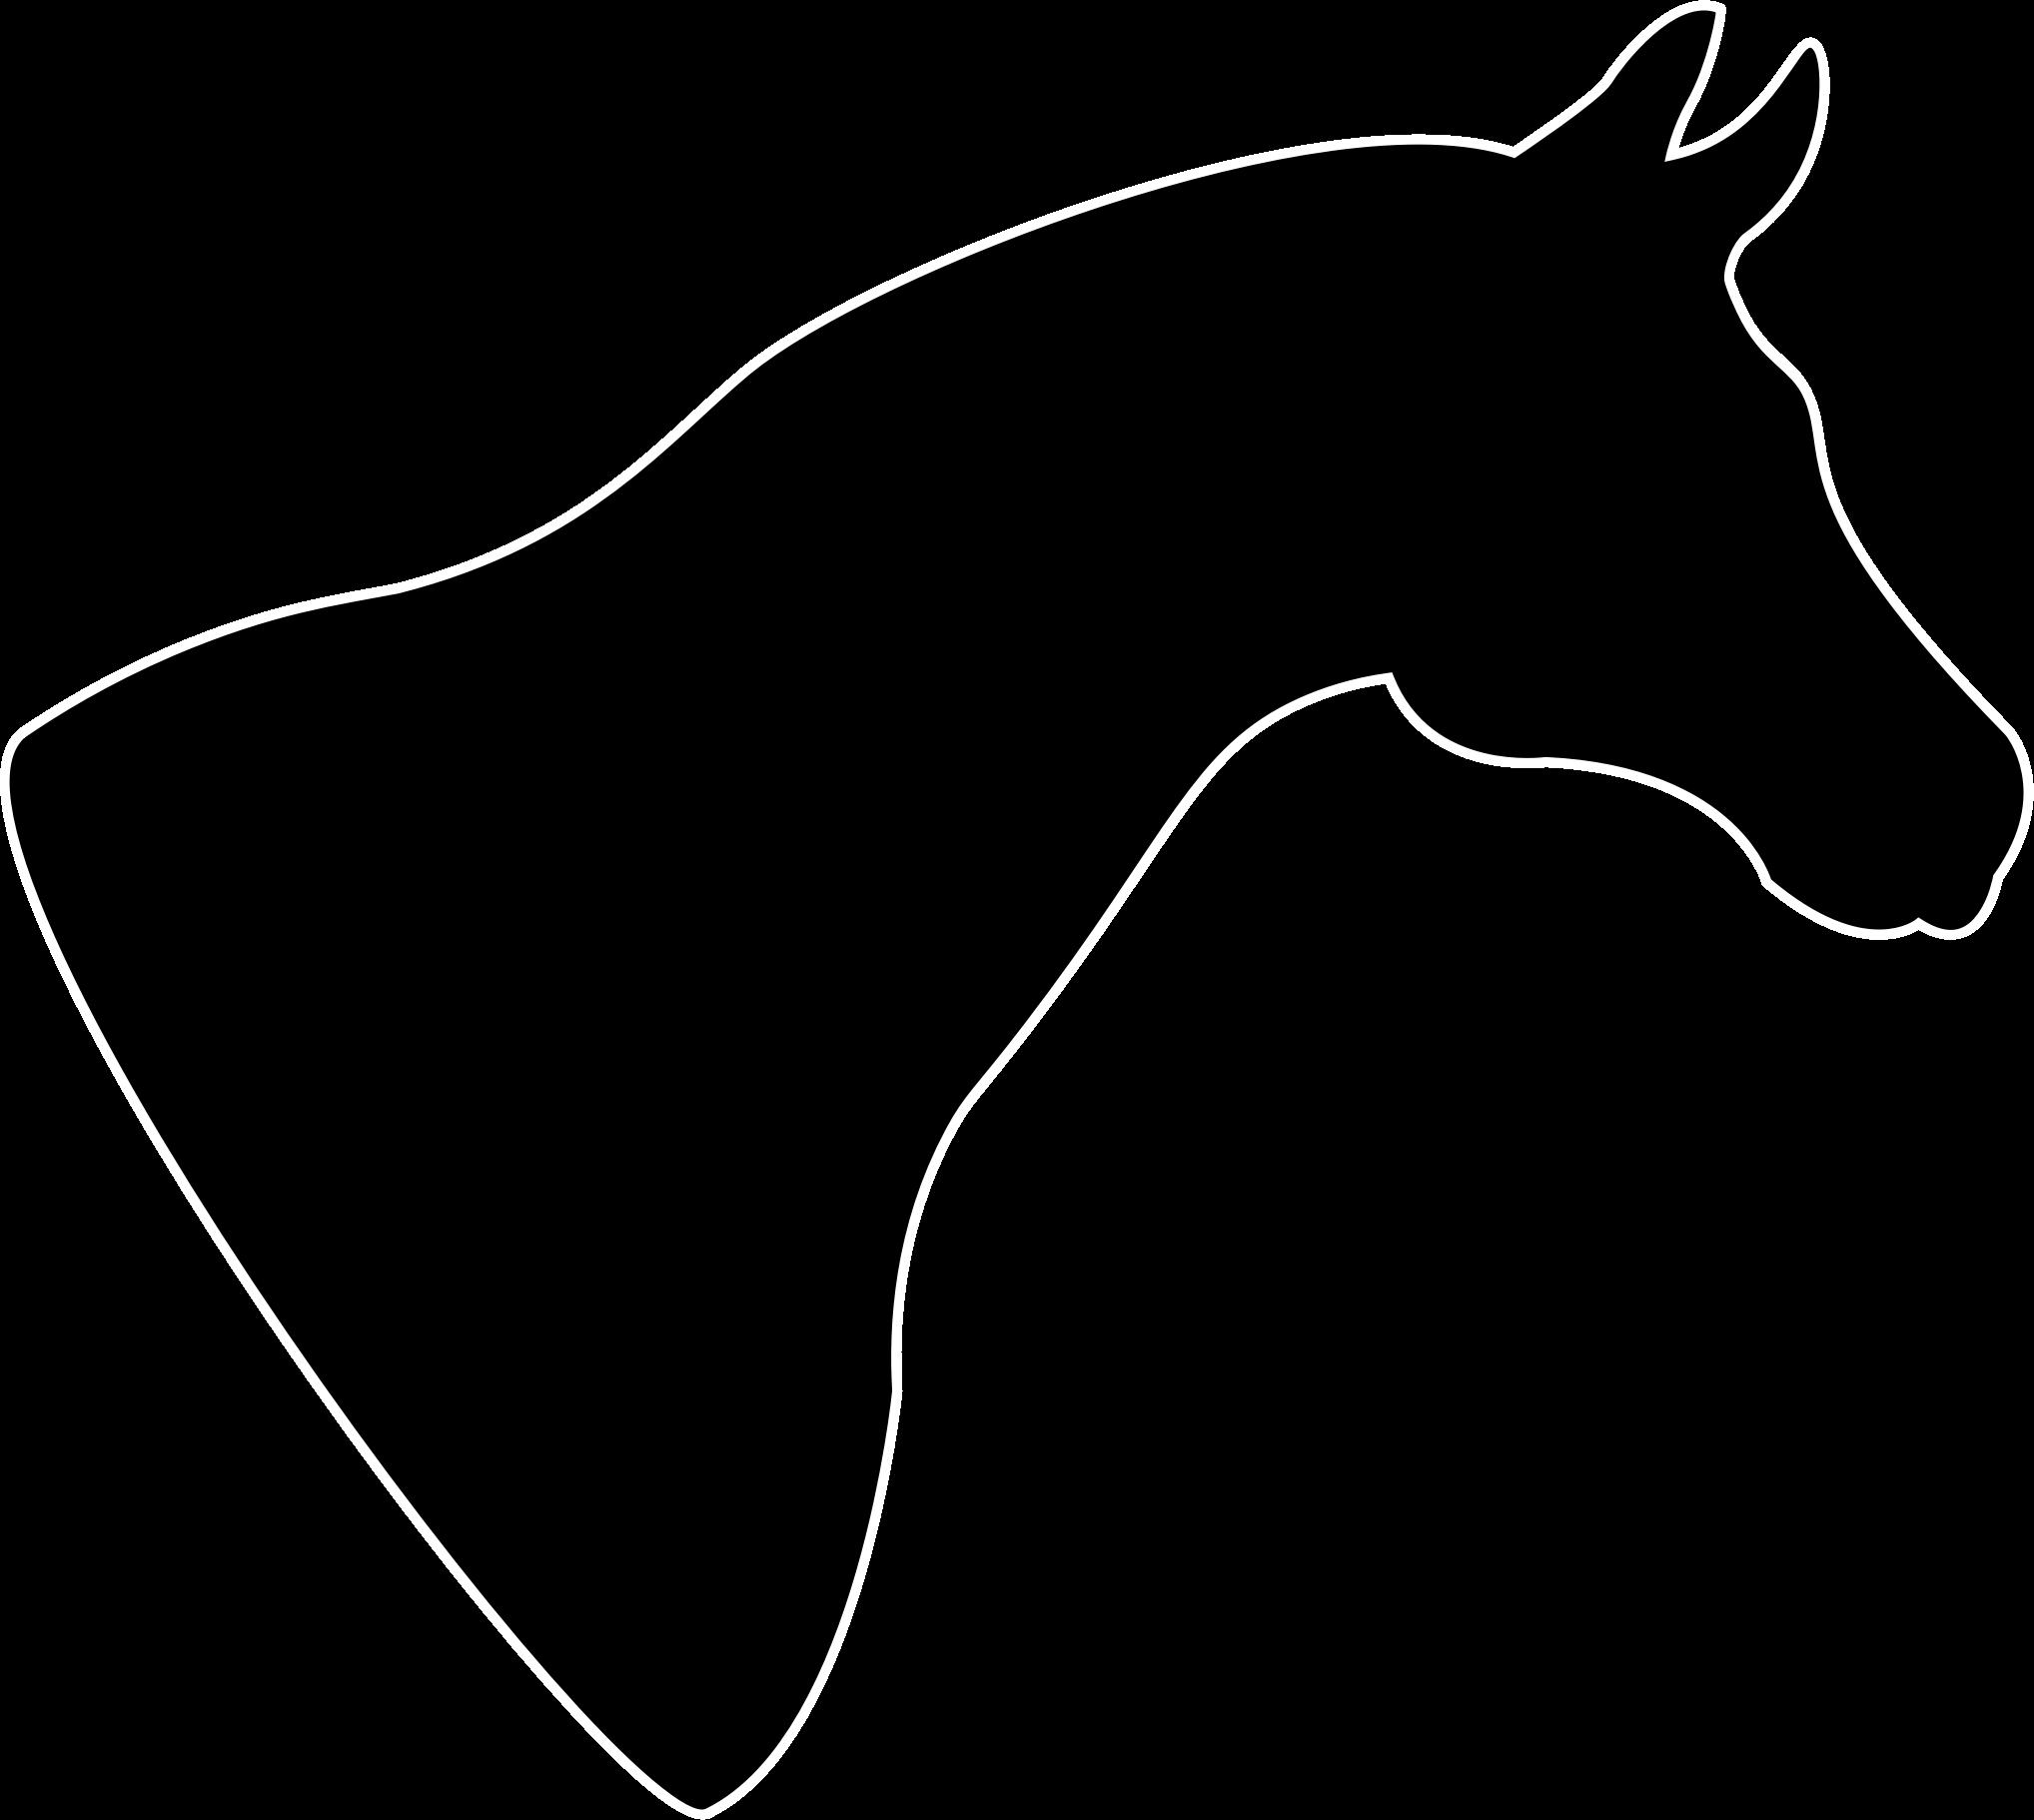 Silhouette at getdrawings com. Poop clipart horse